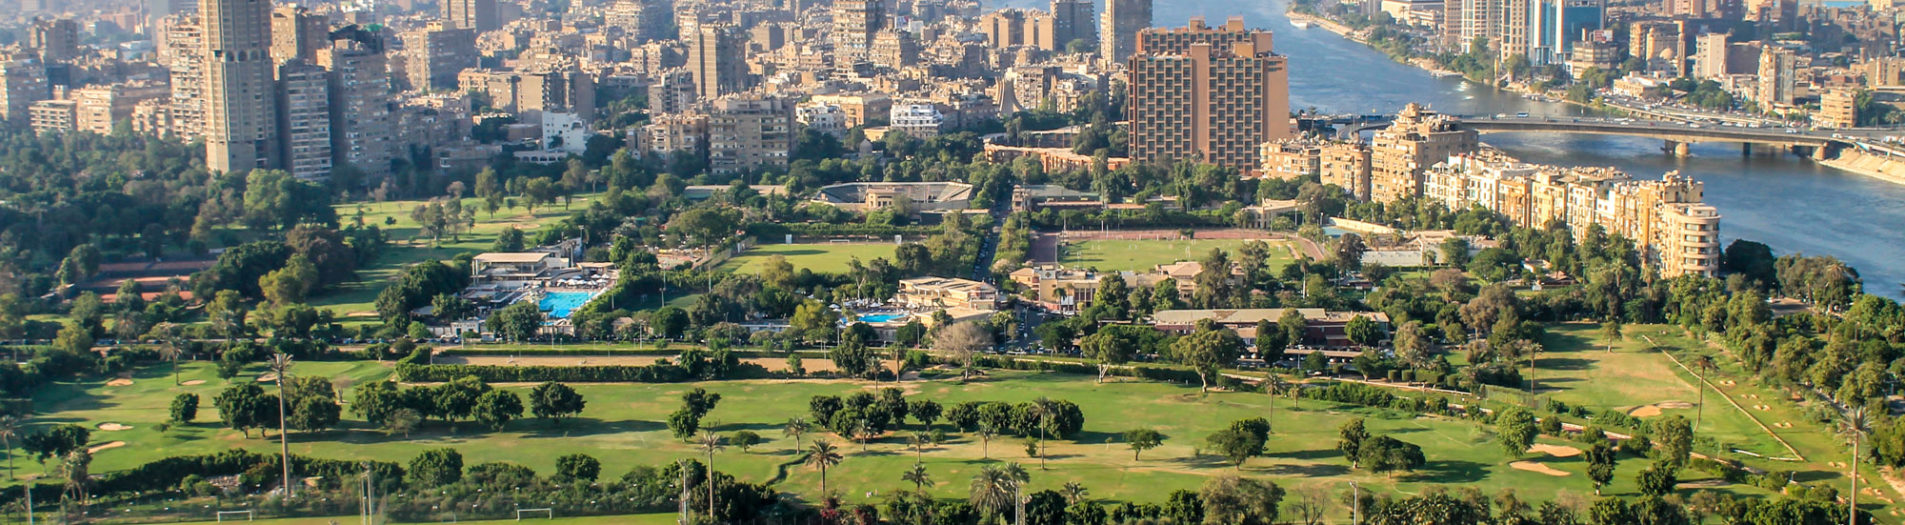 Egypt 2019 مصر